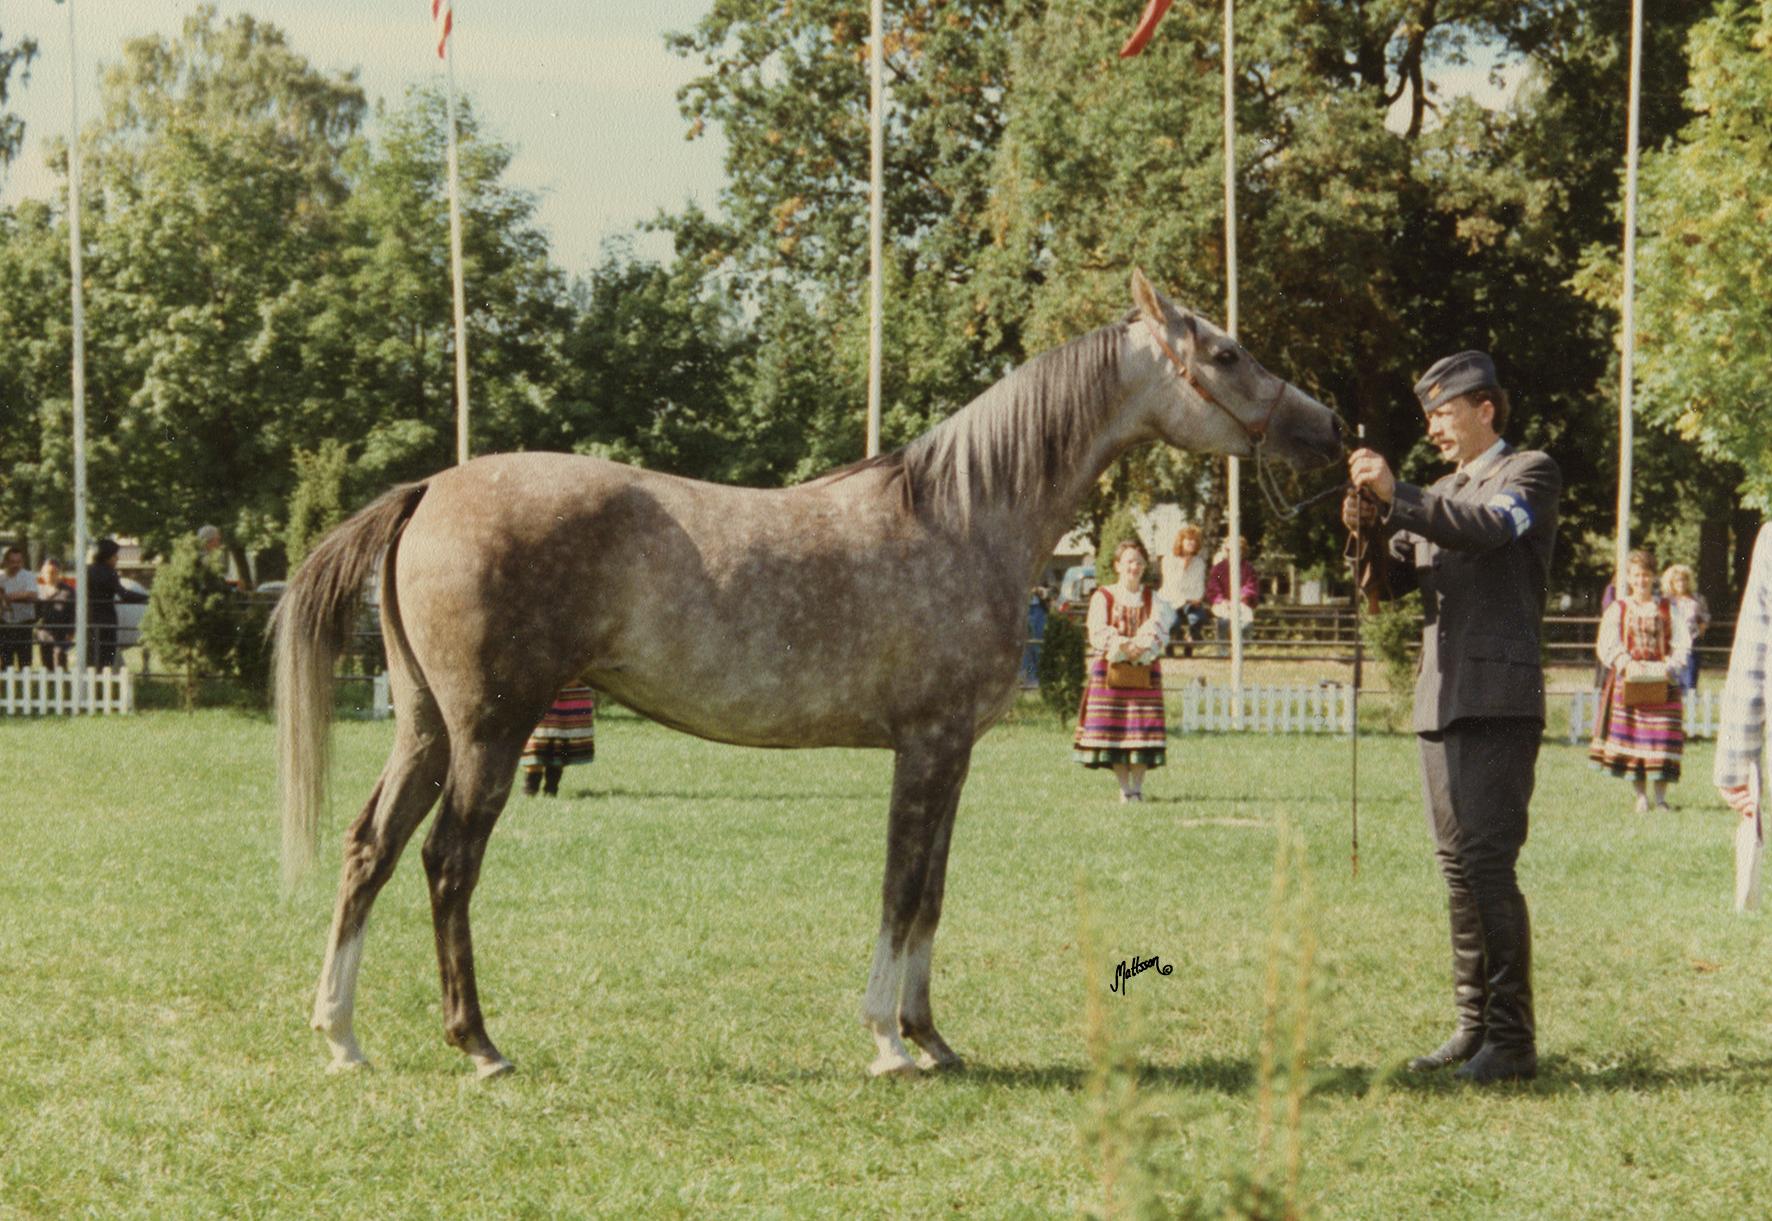 Cudna 1984 (Eternit x Cedrela/Doktryner), photo taken at the Polish National Show in 1989